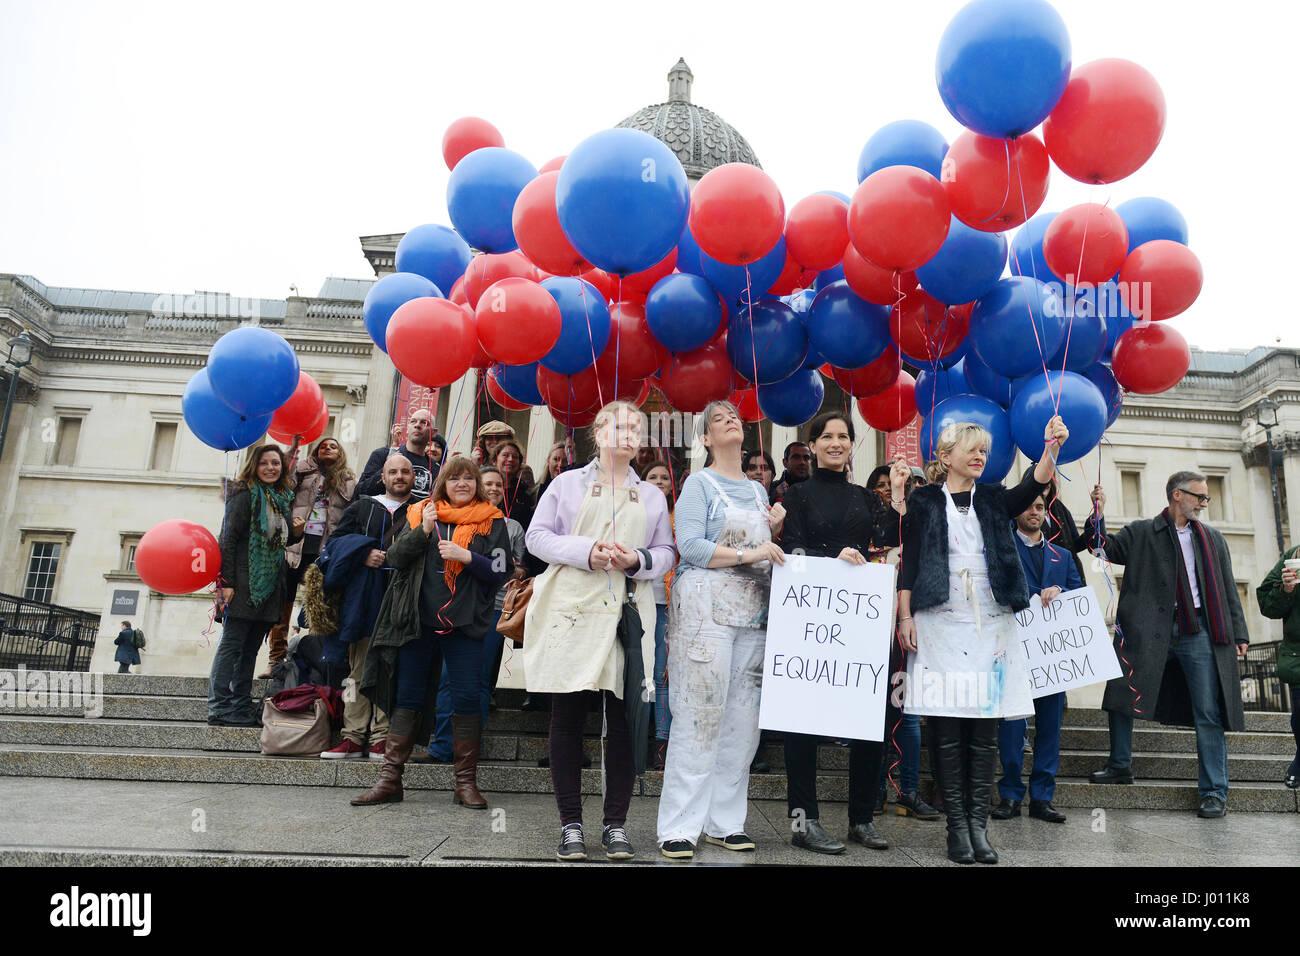 100 Artists Helium Balloons Hold Stockfotos & 100 Artists Helium ...